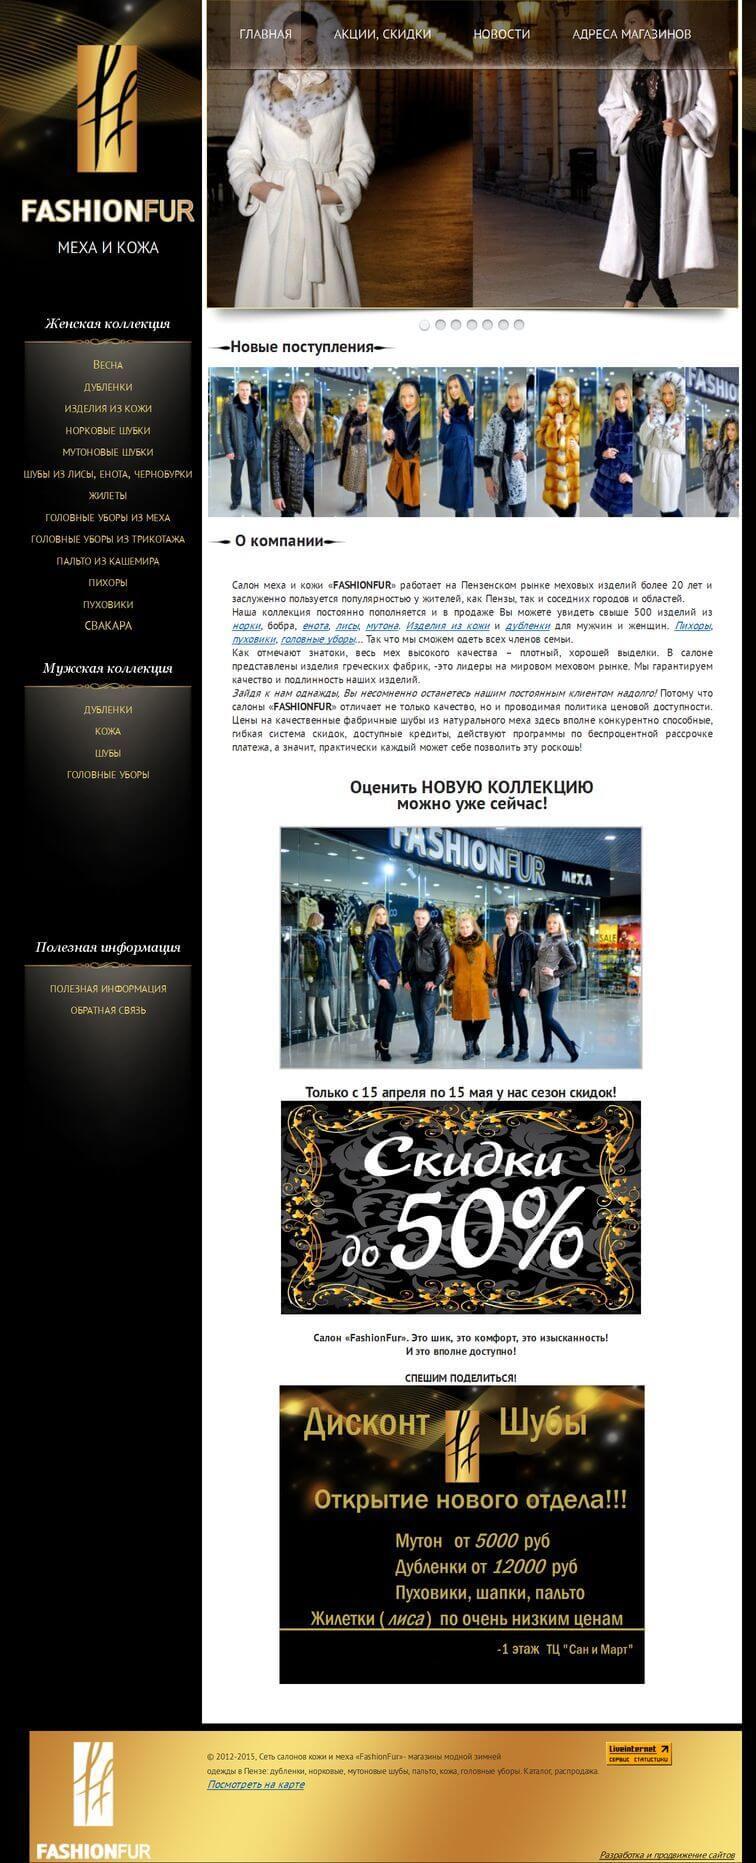 fashionfur-penza.ru